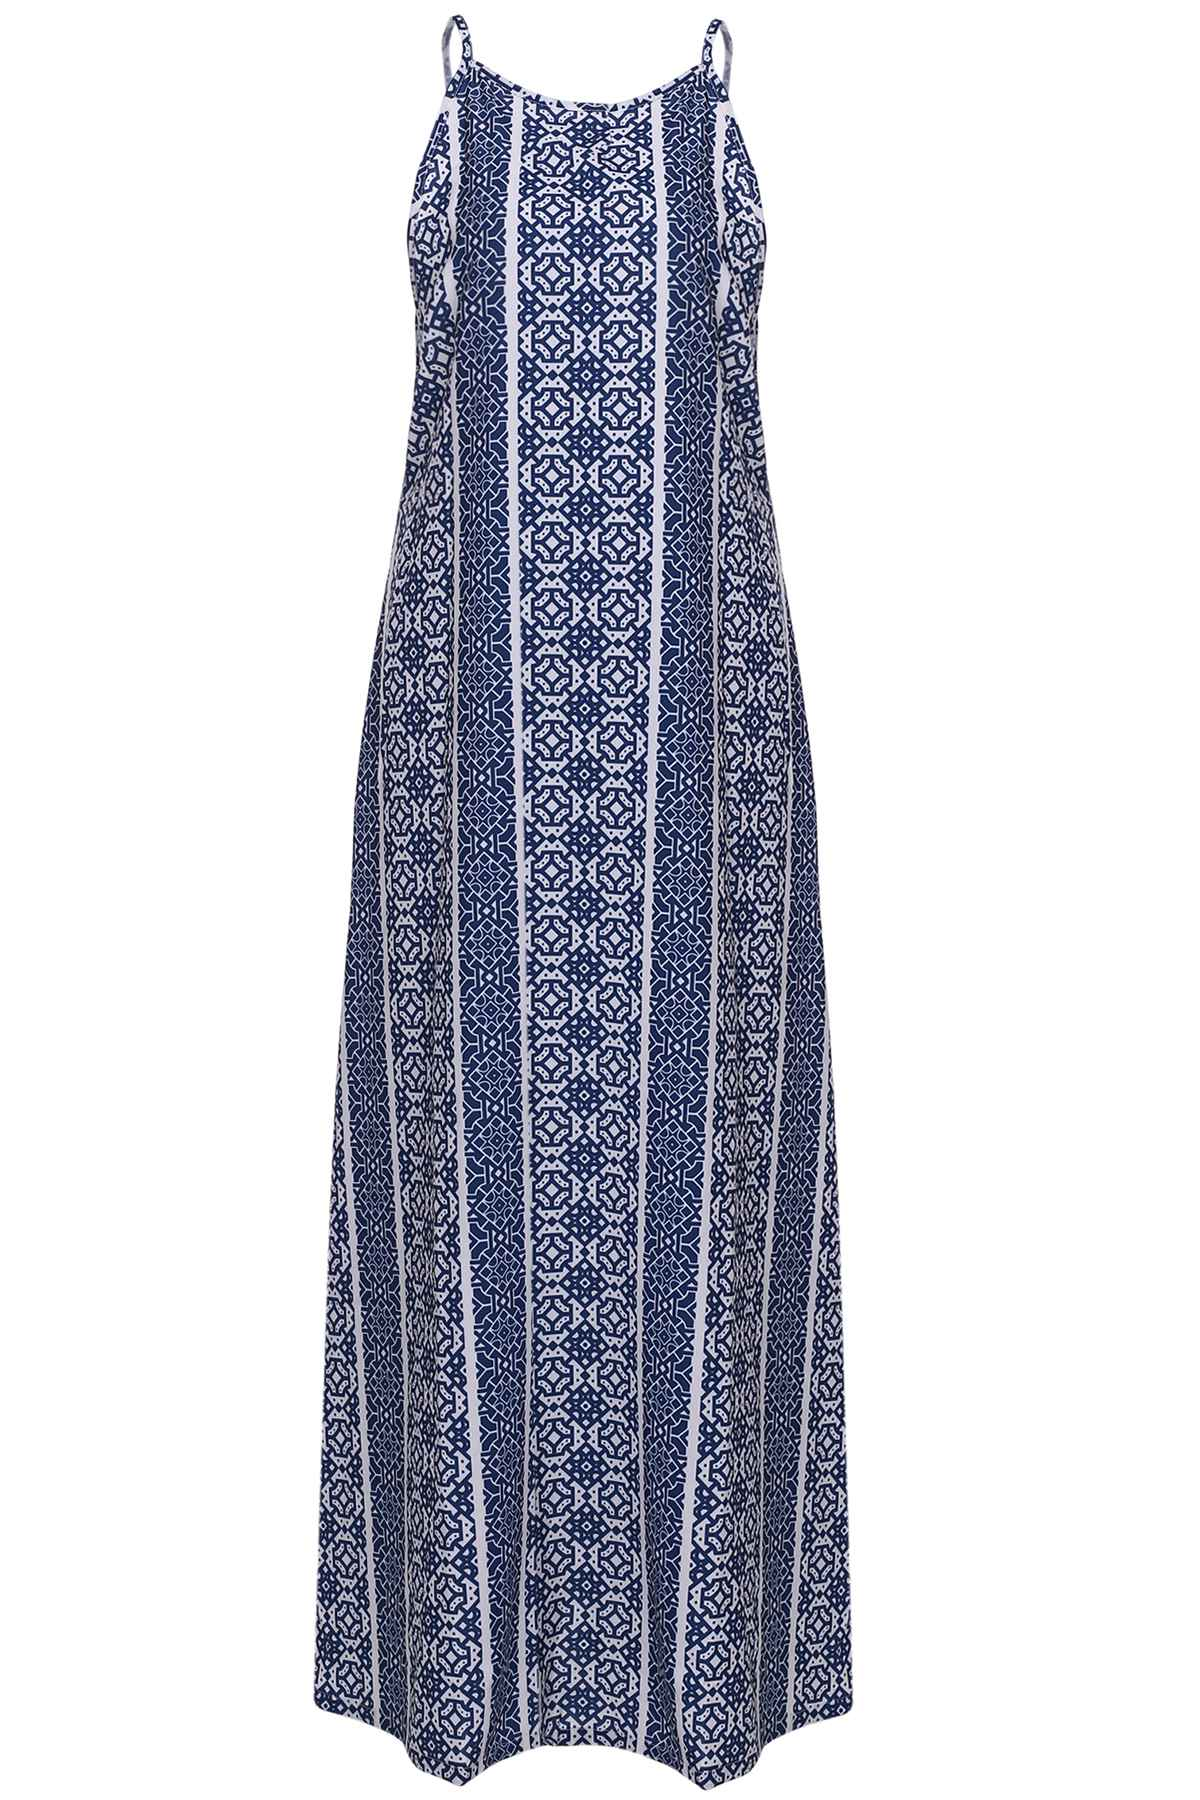 Spaghetti Strap Sleeveless Print Maxi Dress - BLUE/WHITE S